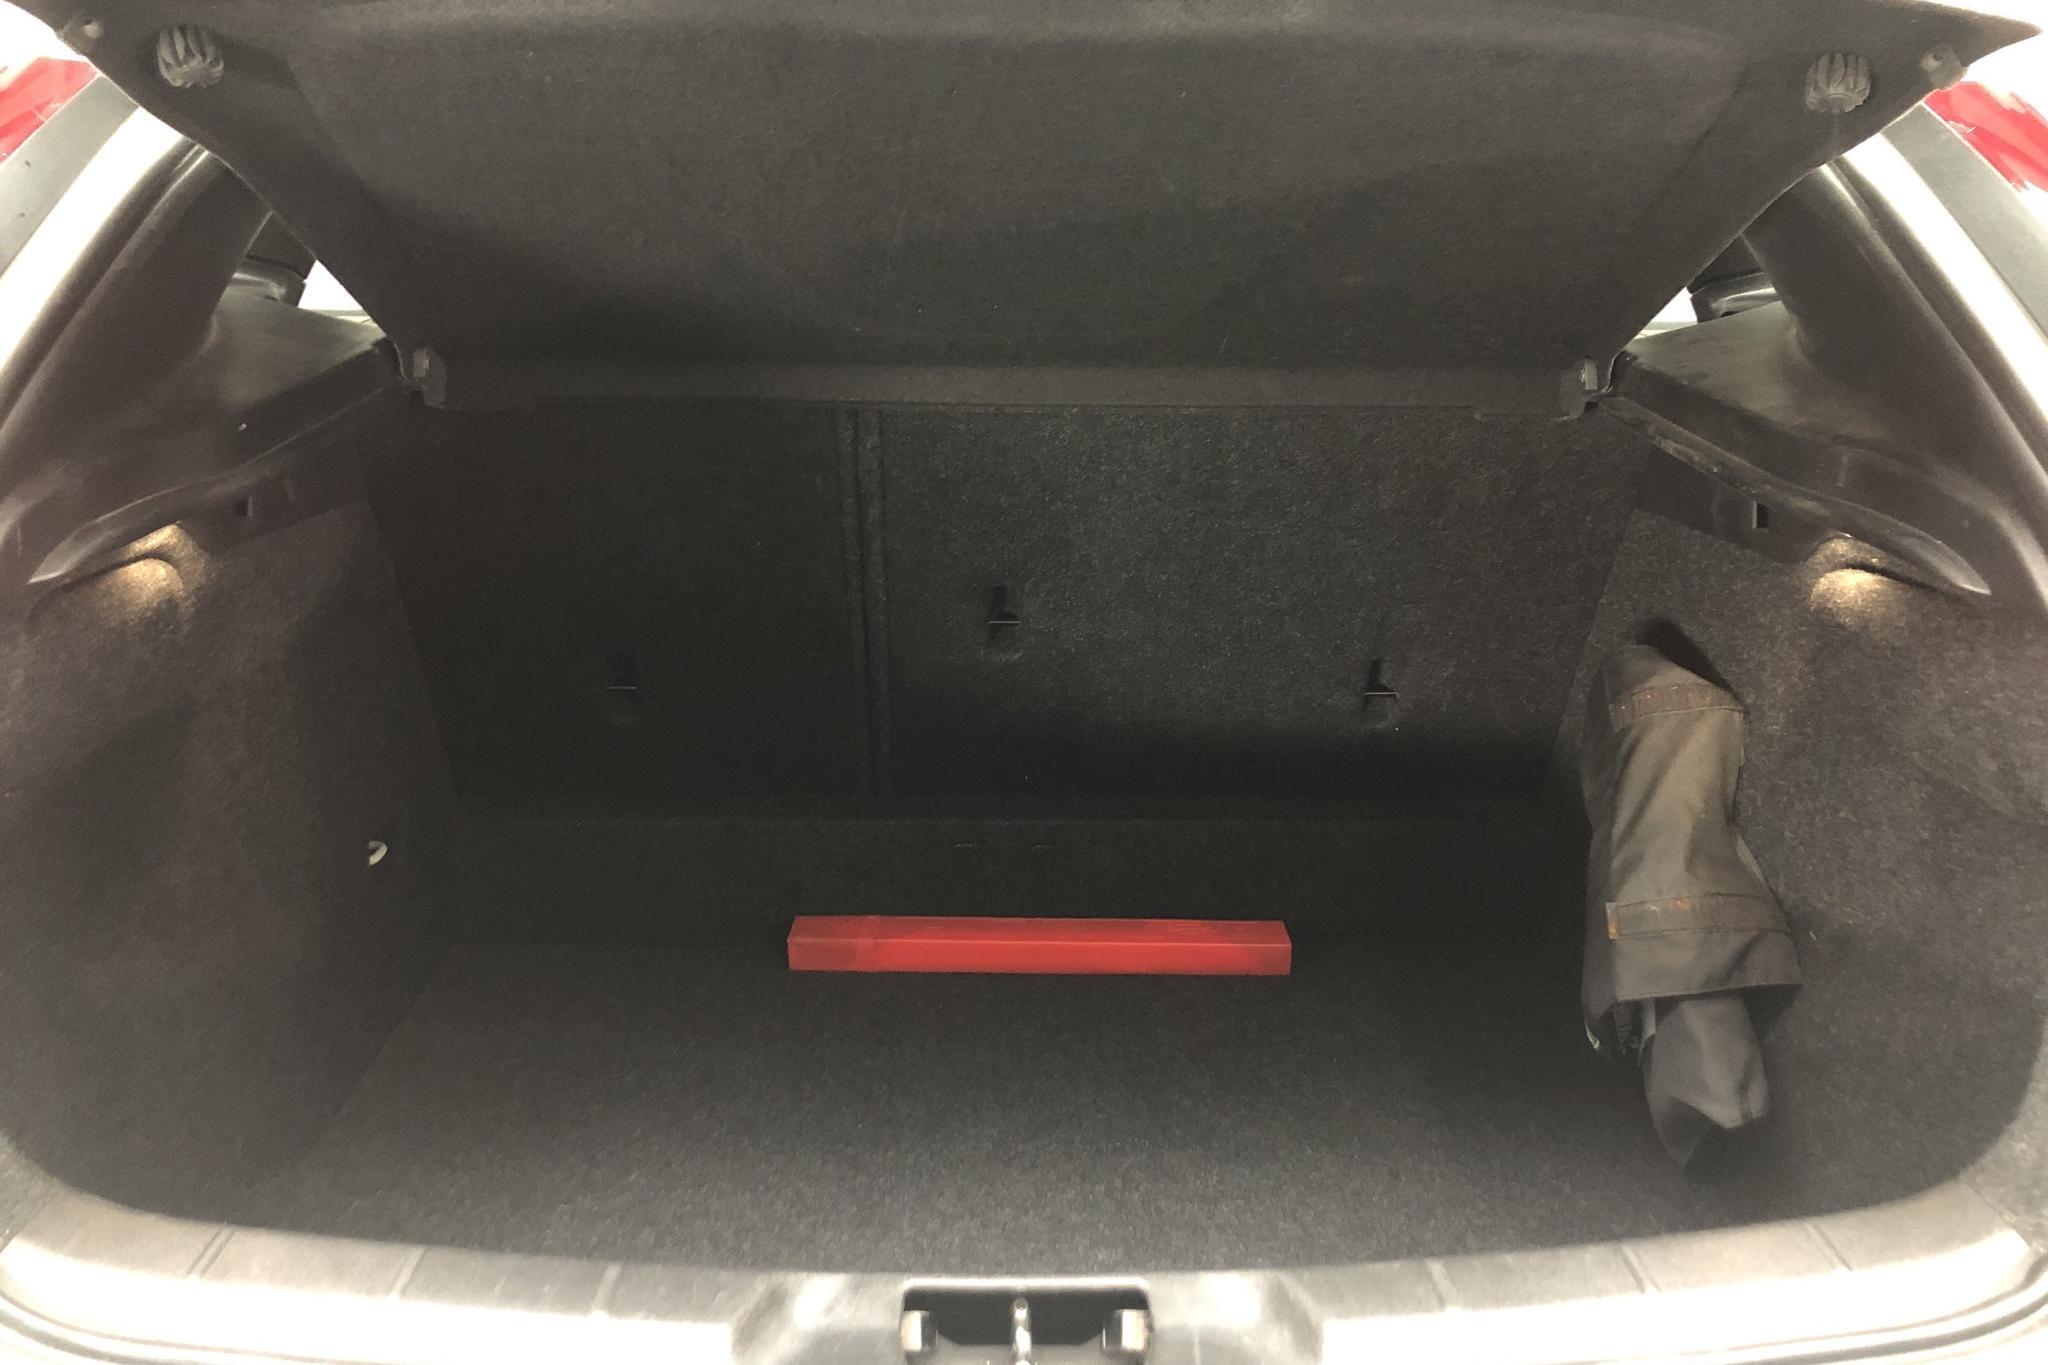 Volvo V40 D2 (115hk) - 4 870 mil - Automat - vit - 2014